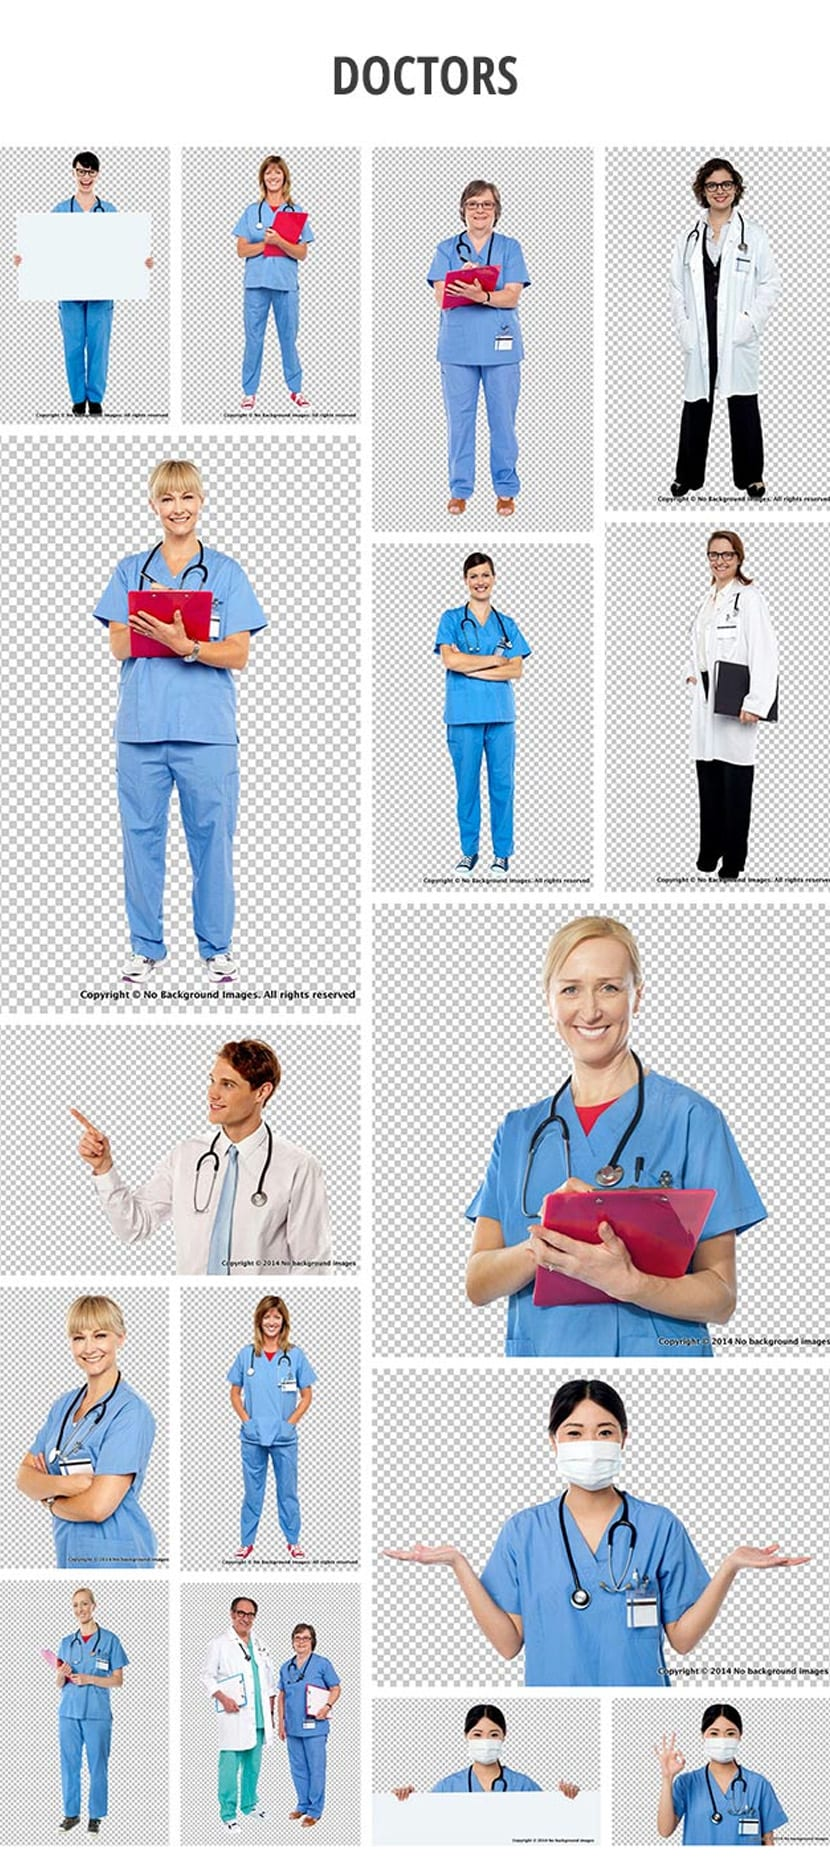 fotografias-profesionales4